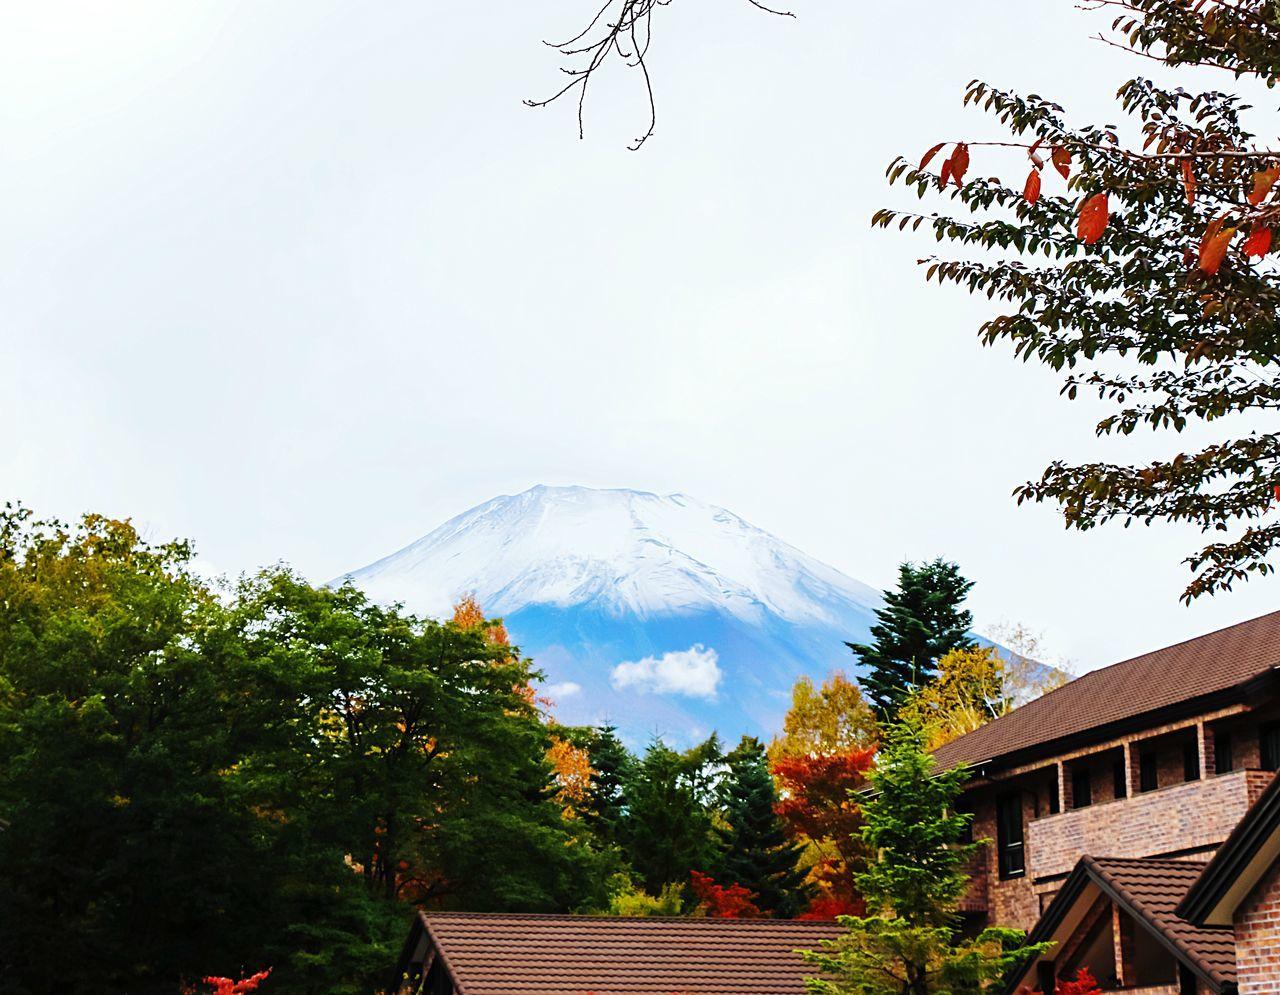 A Series Of Fuji Mountain's Picture -6. Autumn Fujimountain EyeEm Best Edits Beautiful Nature Autumn Leaves Autumn Colors Fuji Mountain Mt.Fuji Natrual Beauty  Fujiyama